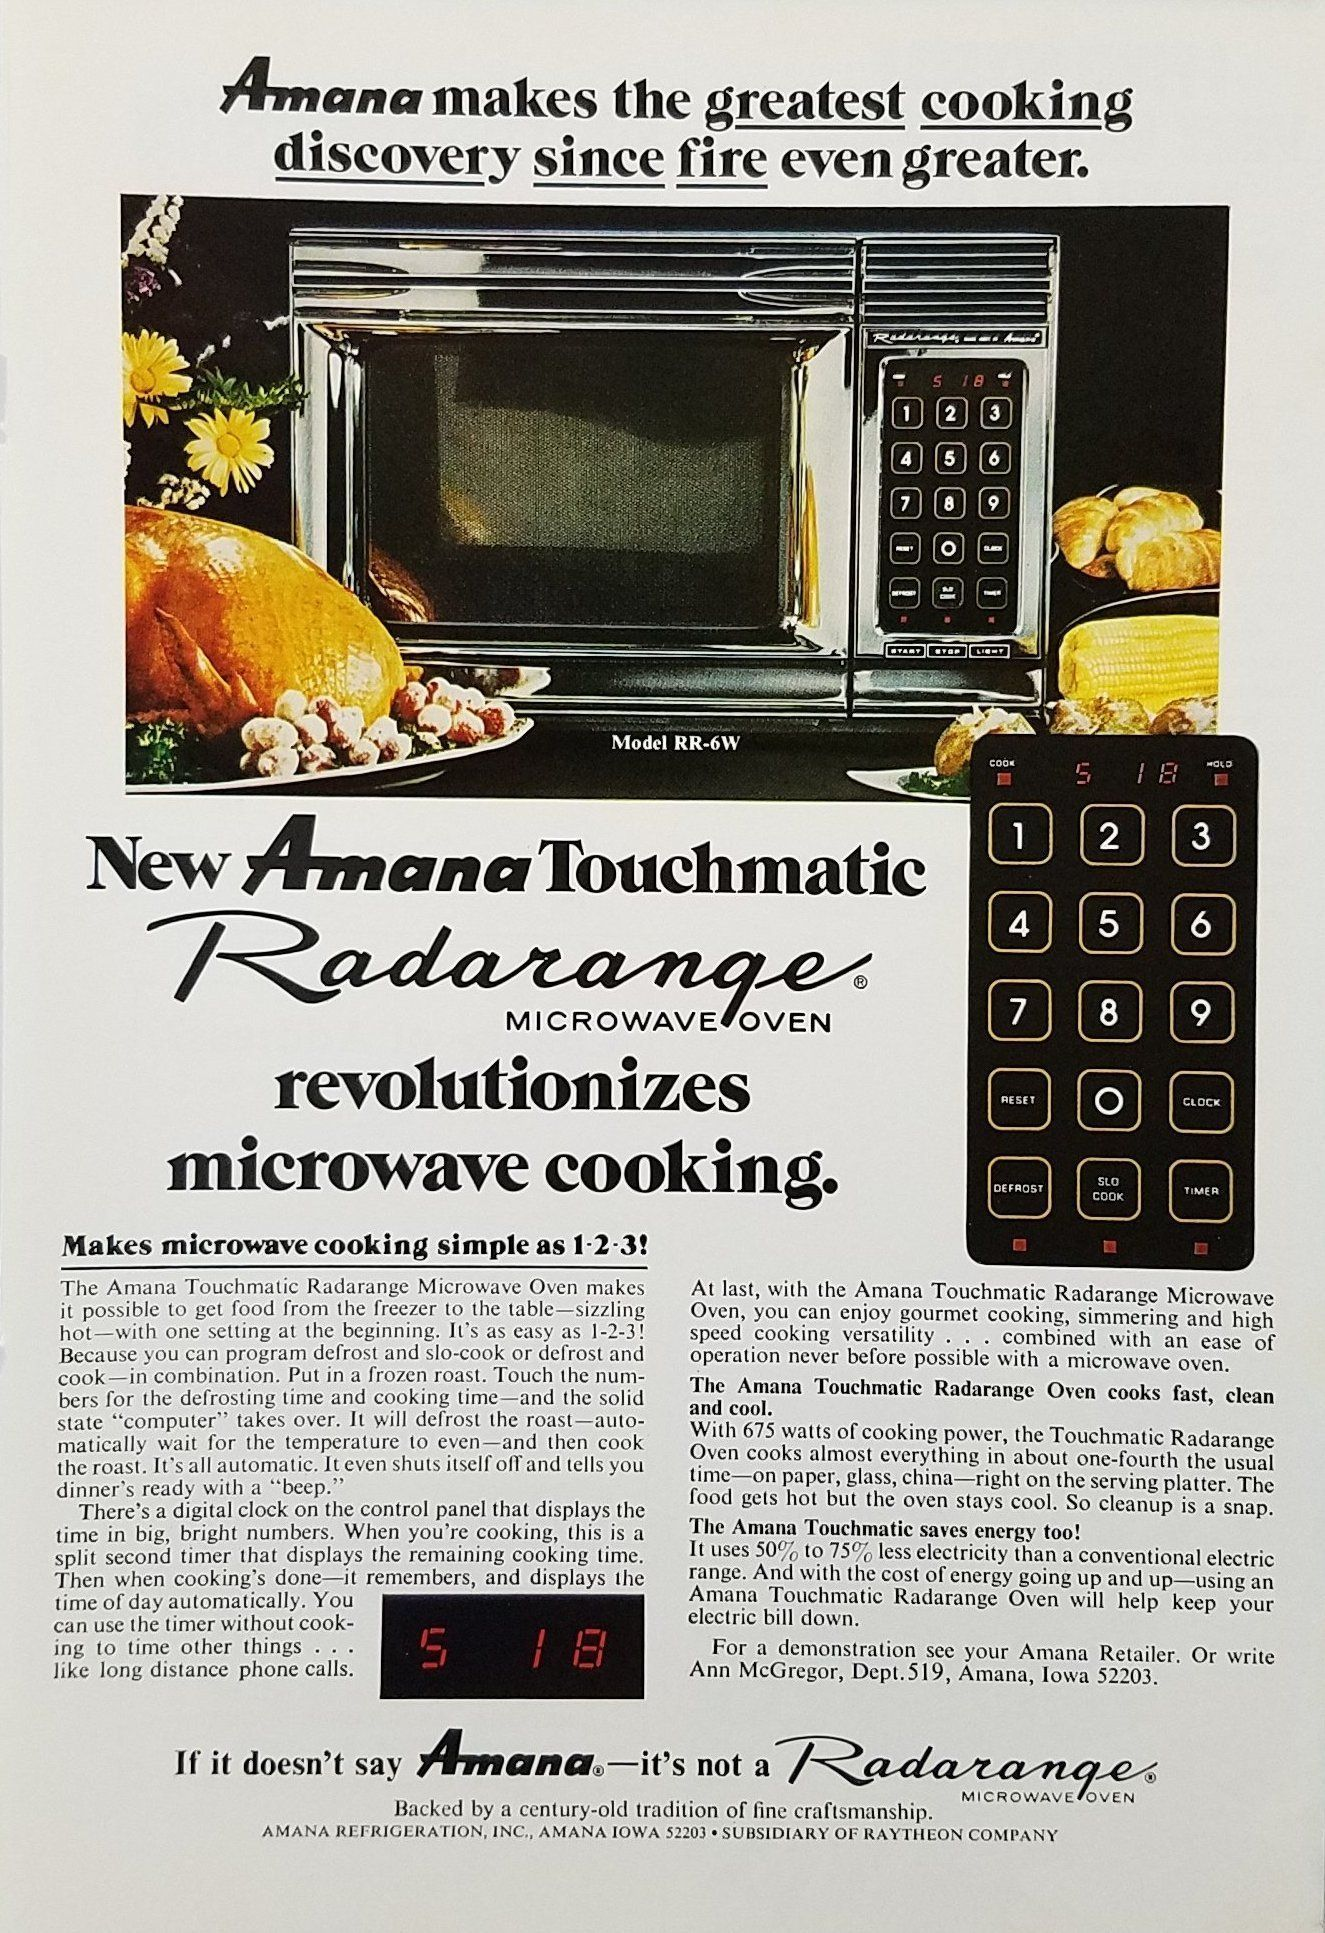 1970s Amana Touchmatic Radarange Microwave Oven Vintage Ad Refrigerator Wiring Diagram On Oil Furnace Older Homeappliancesadvertisement